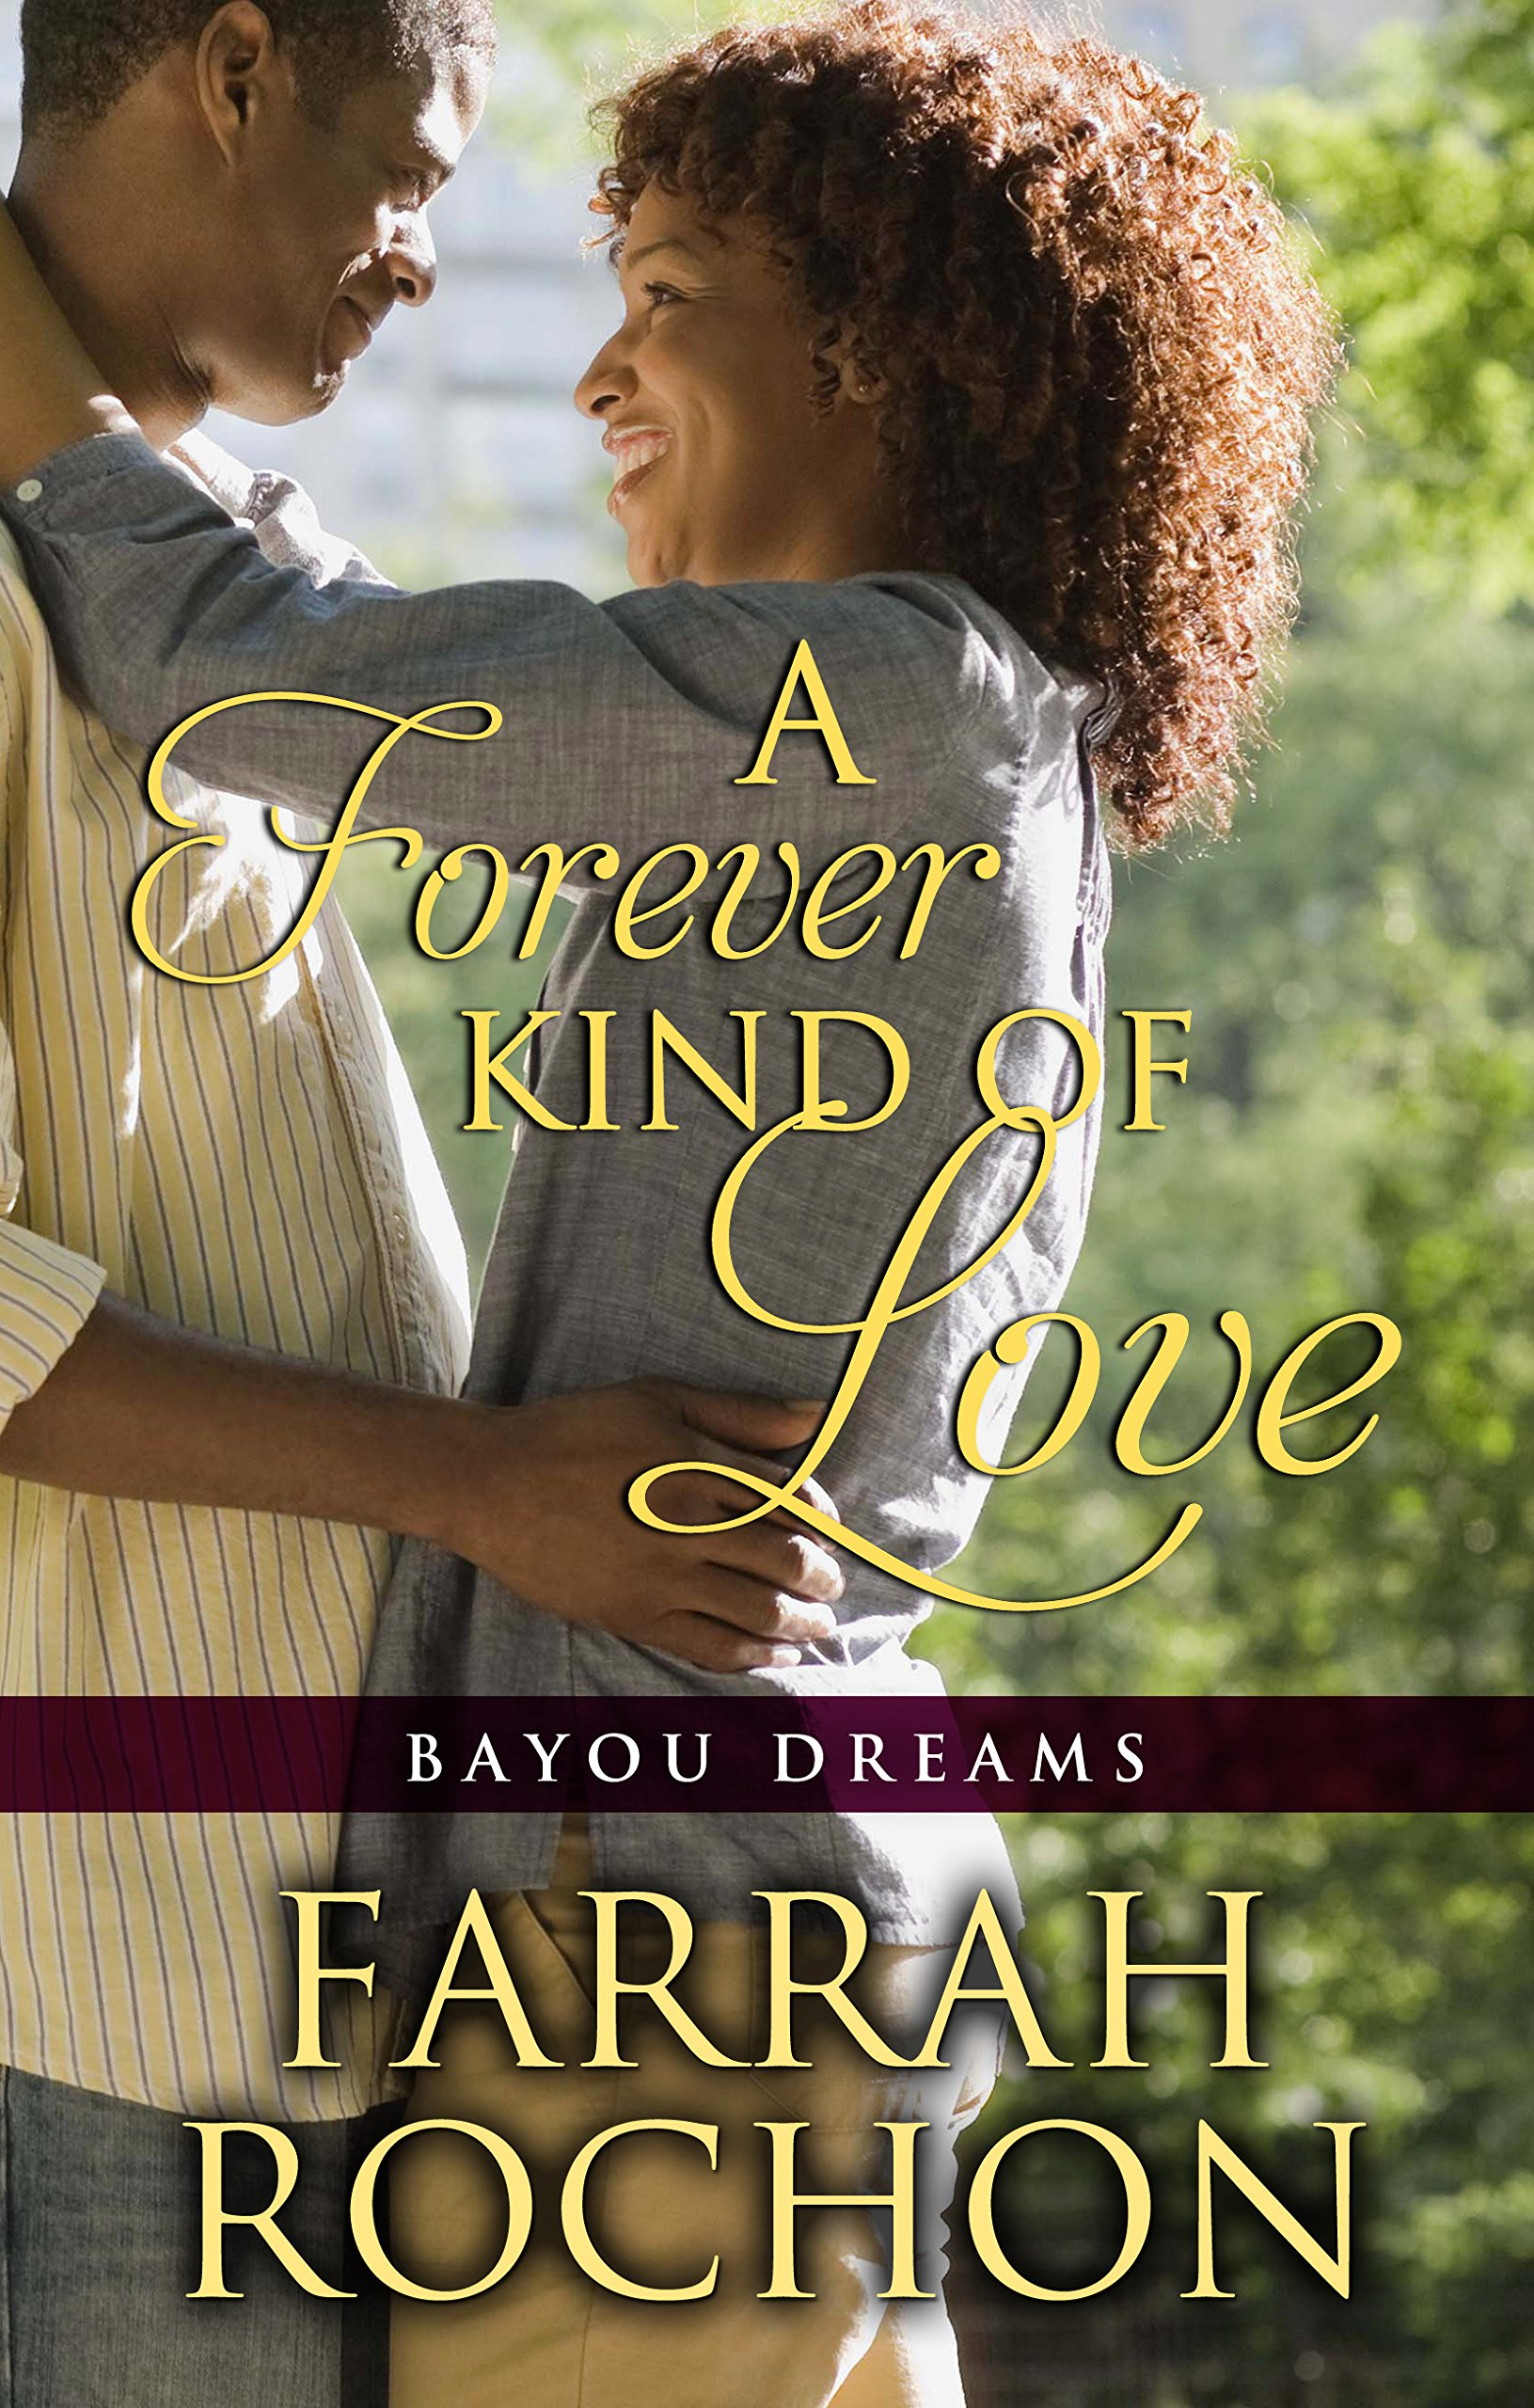 Amazon.com: A Forever Kind Of Love (Bayou Dreams) (9781410474346): Farrah  Rochon: Books